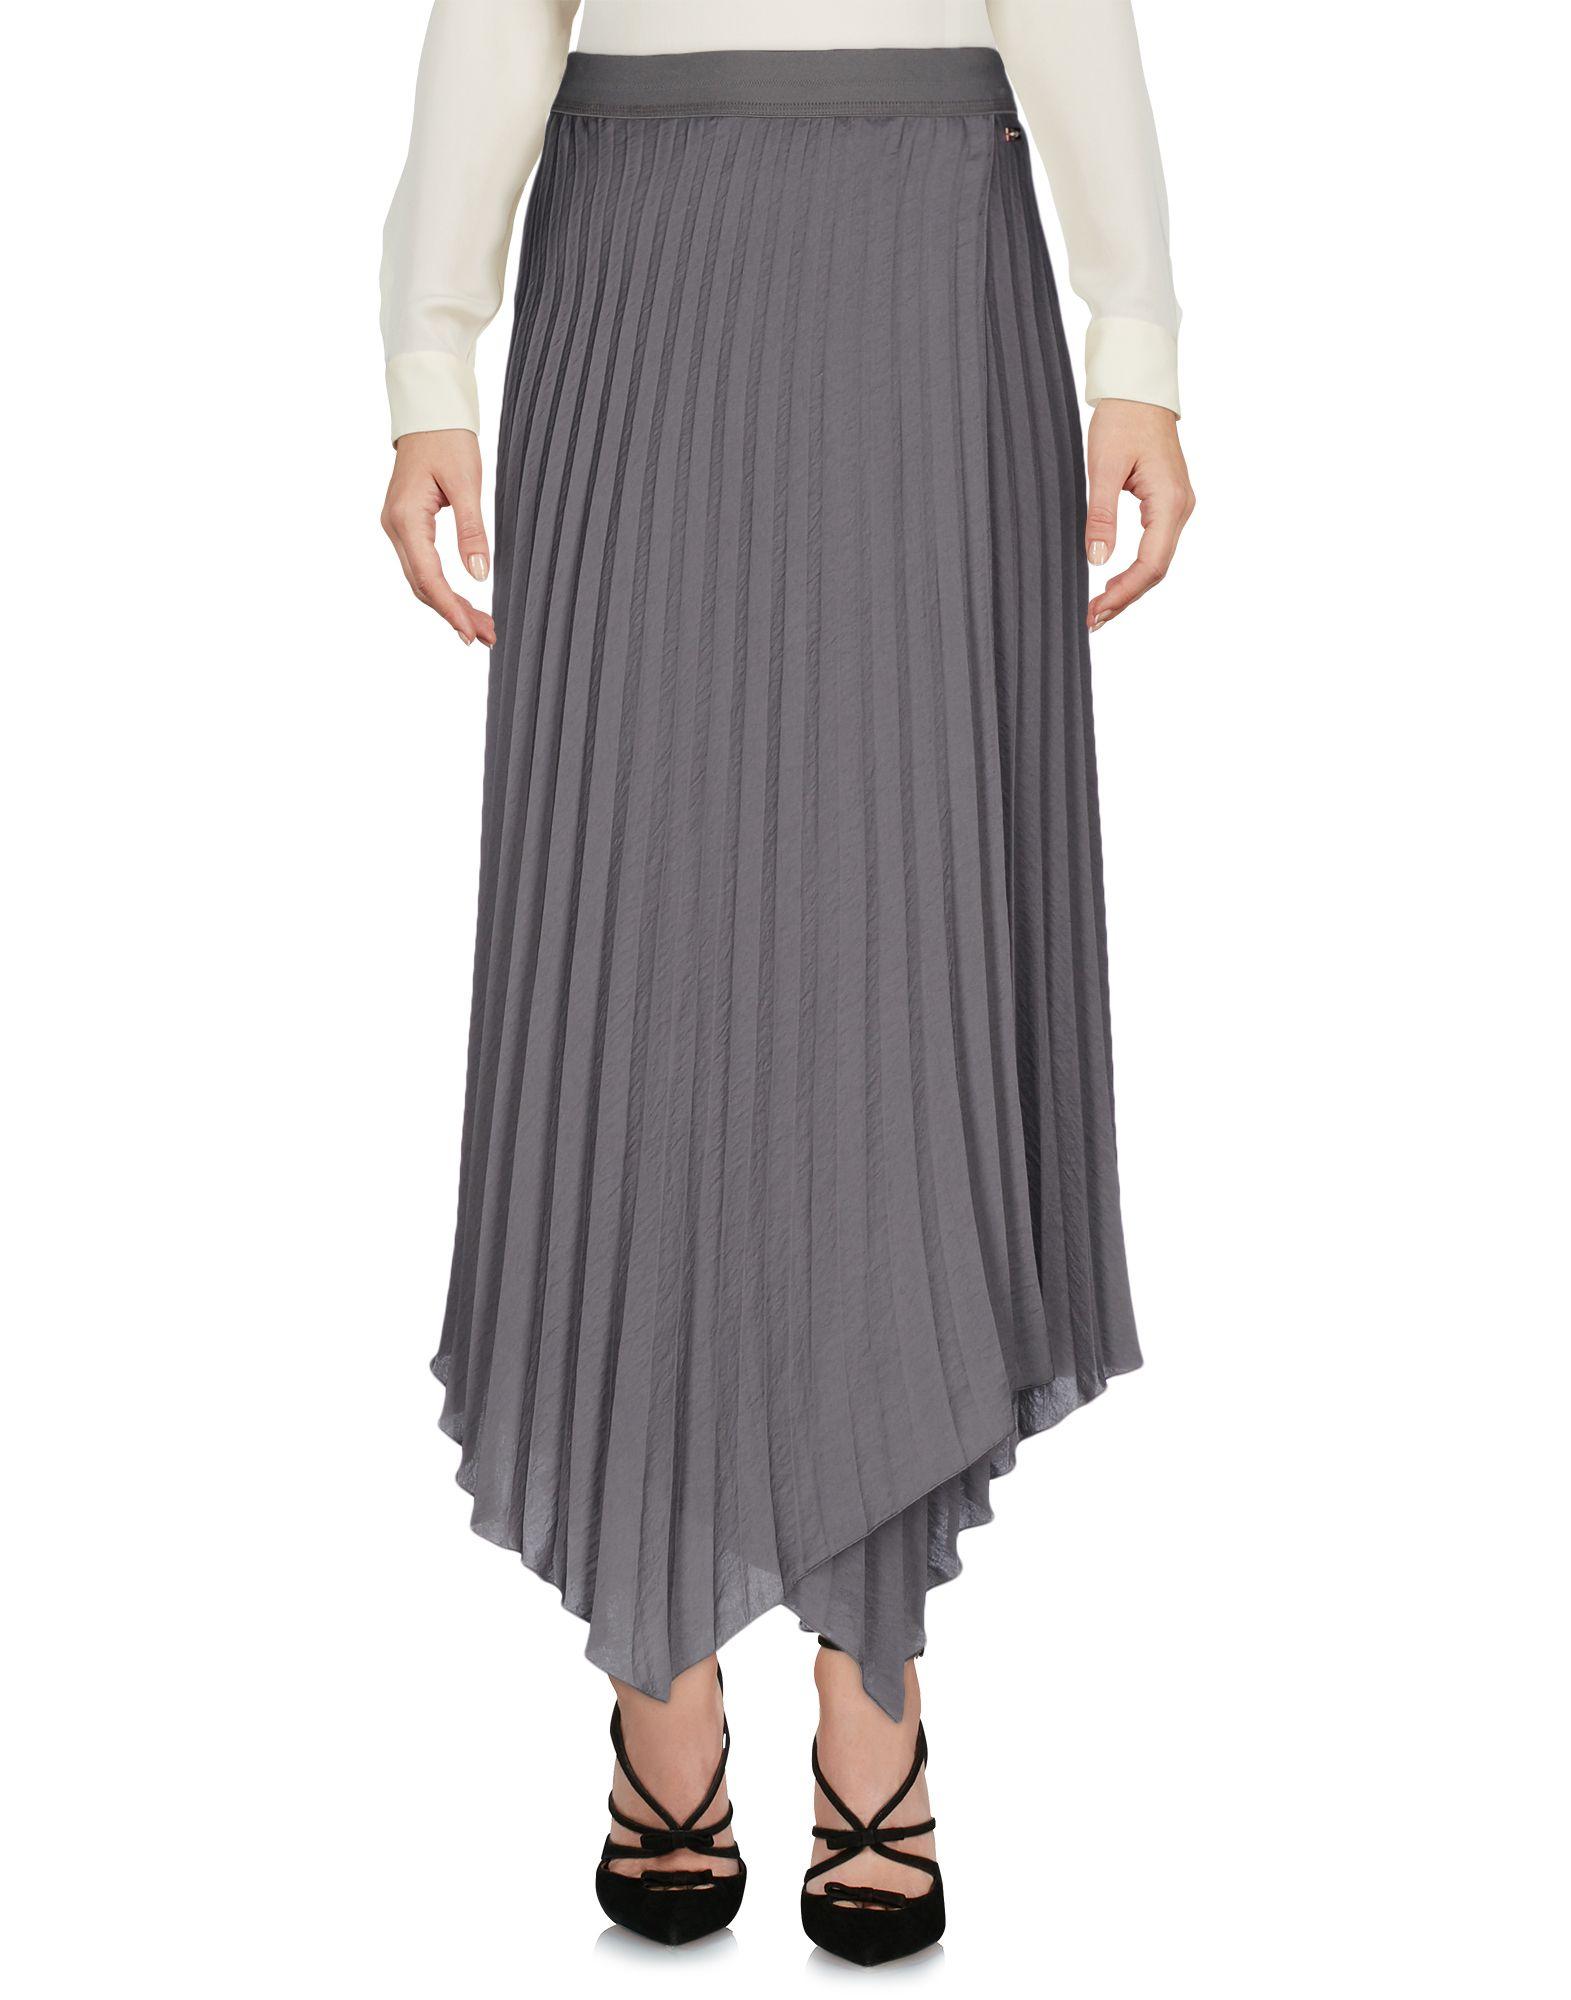 260fb169c escada sport shirts tops for women - Buy best women's escada sport shirts  tops on Cools.com Shop